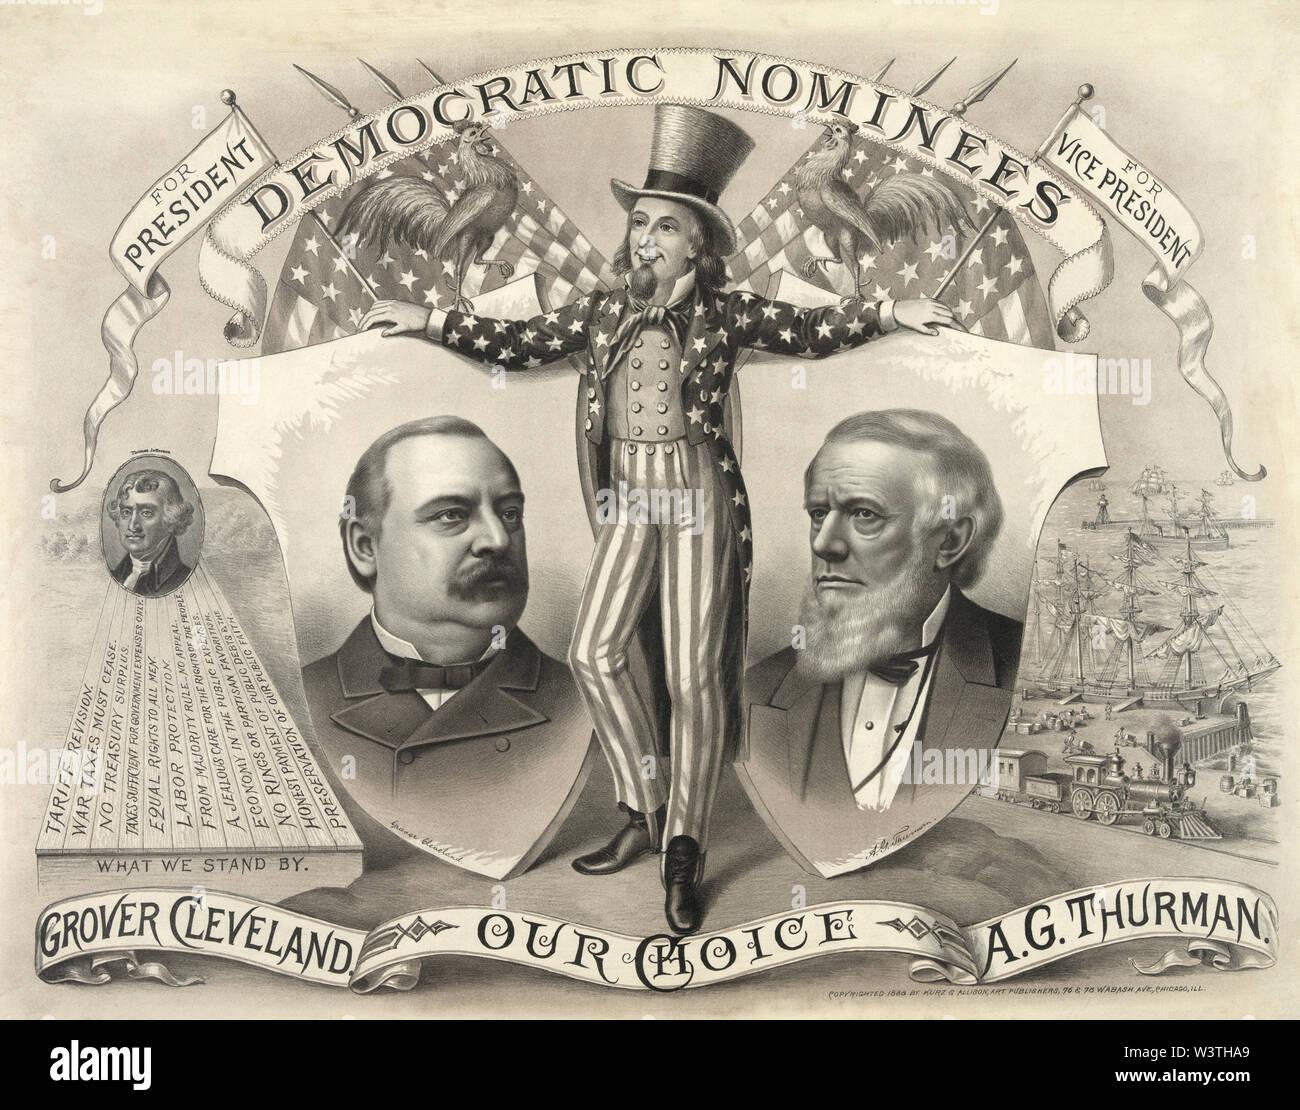 Nuestra elección, Grover Cleveland, A.G. Thurman, Democrática candidatos para Presidente y Vicepresidente, la campaña de carteles, litografía, Kurz & Allison, 1888 Imagen De Stock